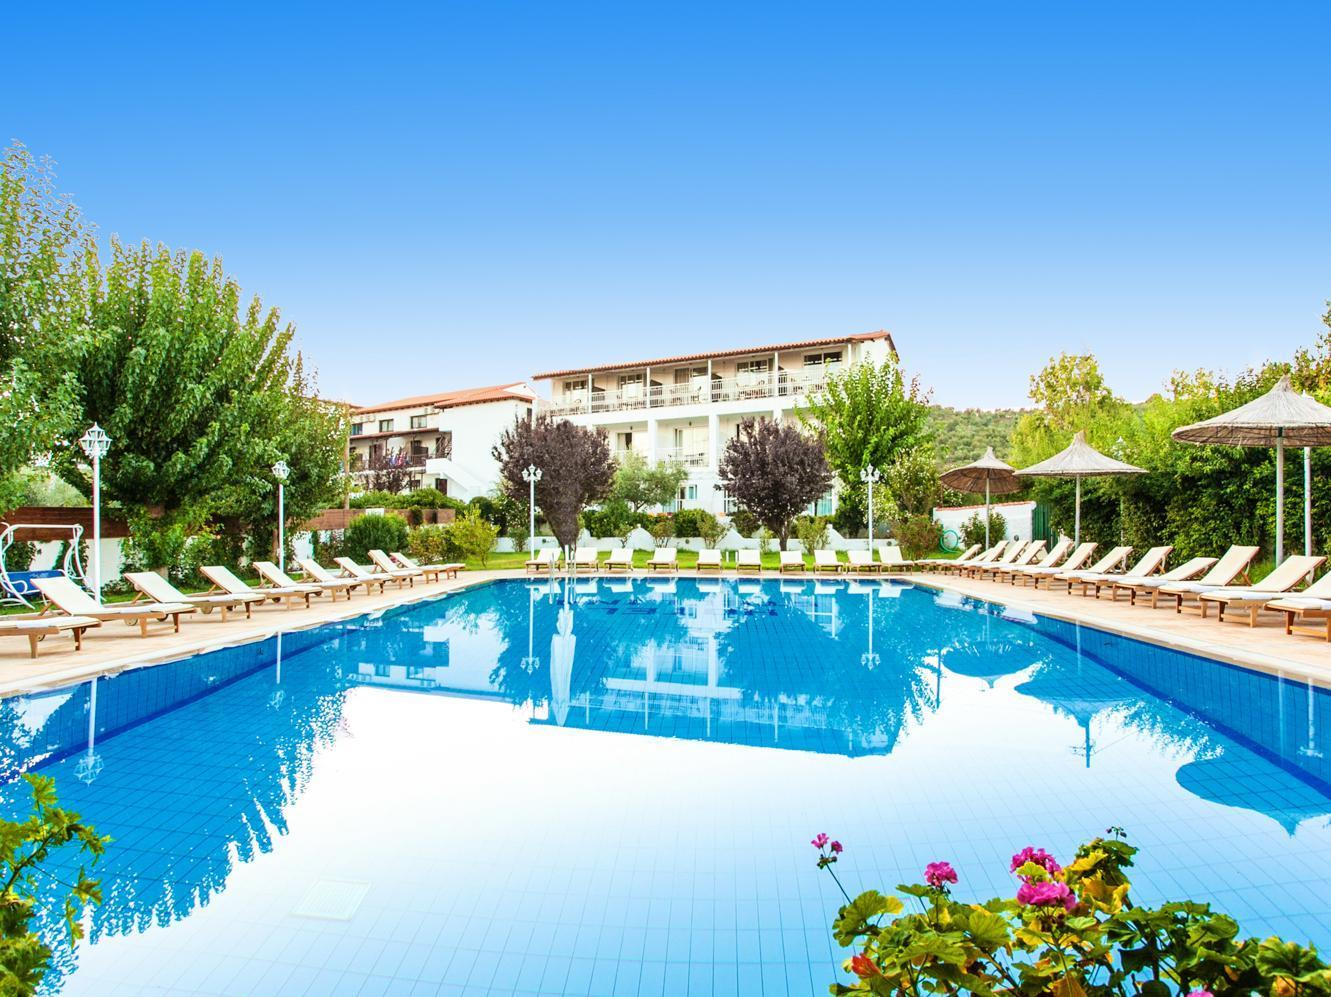 Stellina hotel skiathos town skiathos island greece for Skiathos hotels